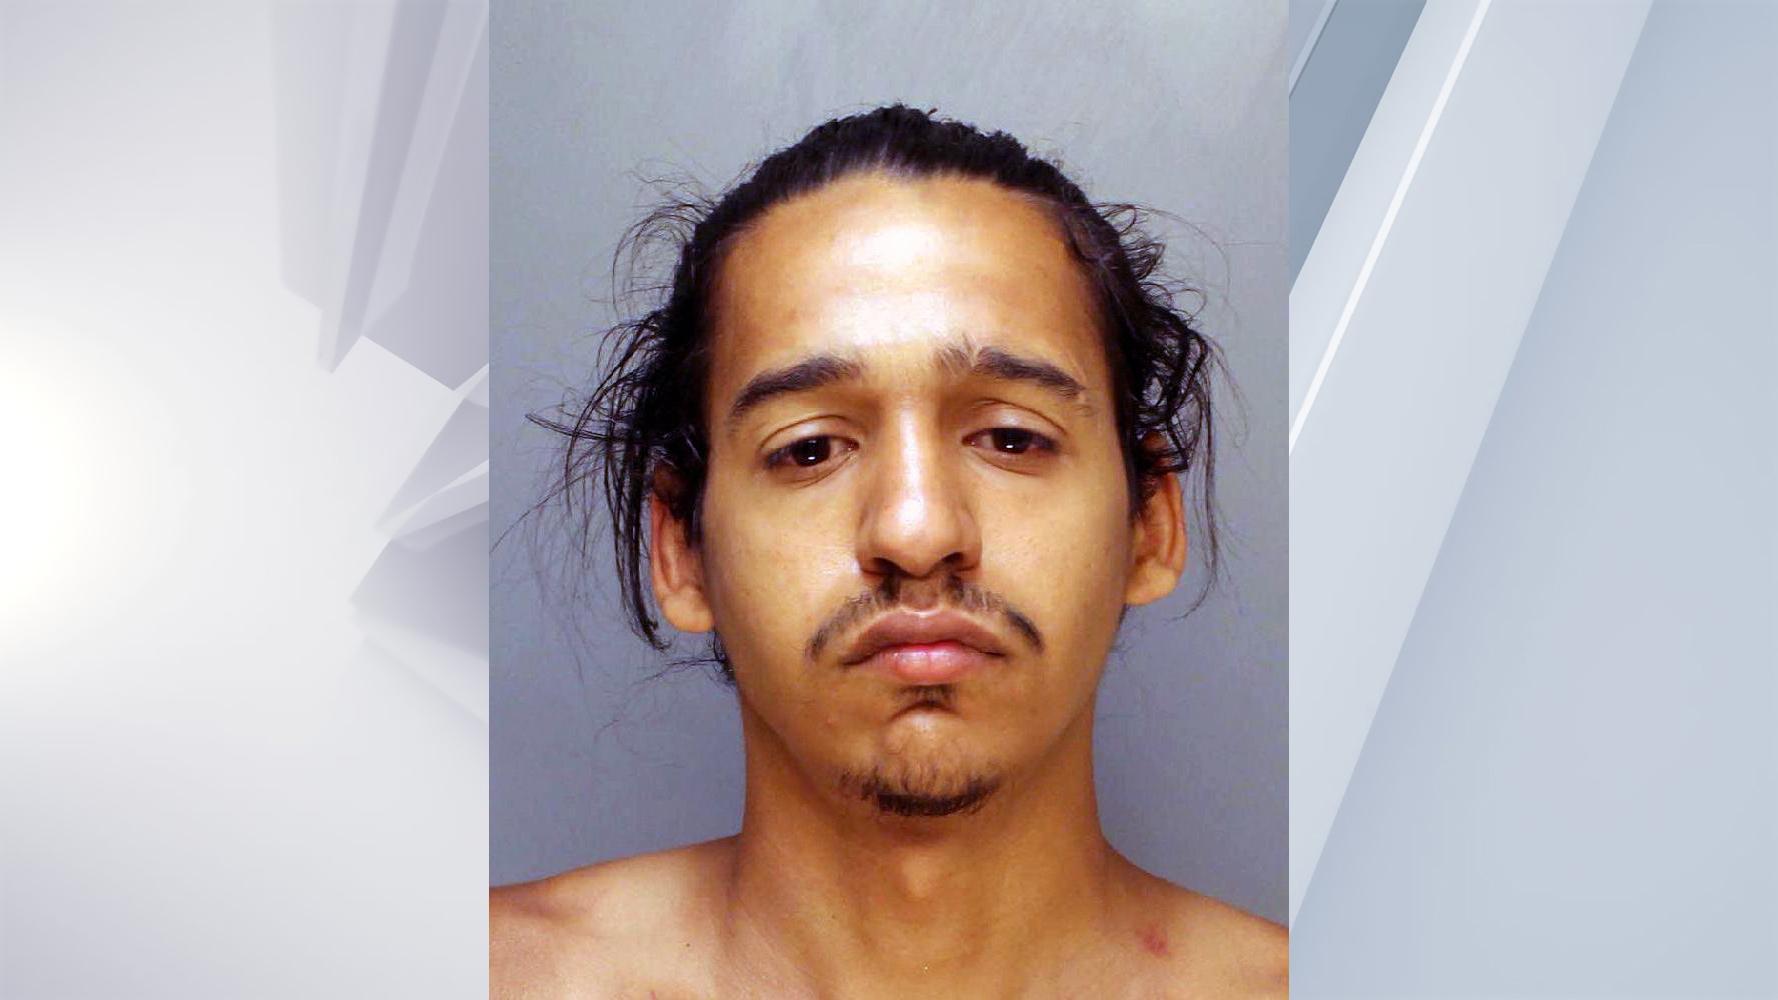 Carlos Morales mugshot (Philly's Most Wanted Fugitives)